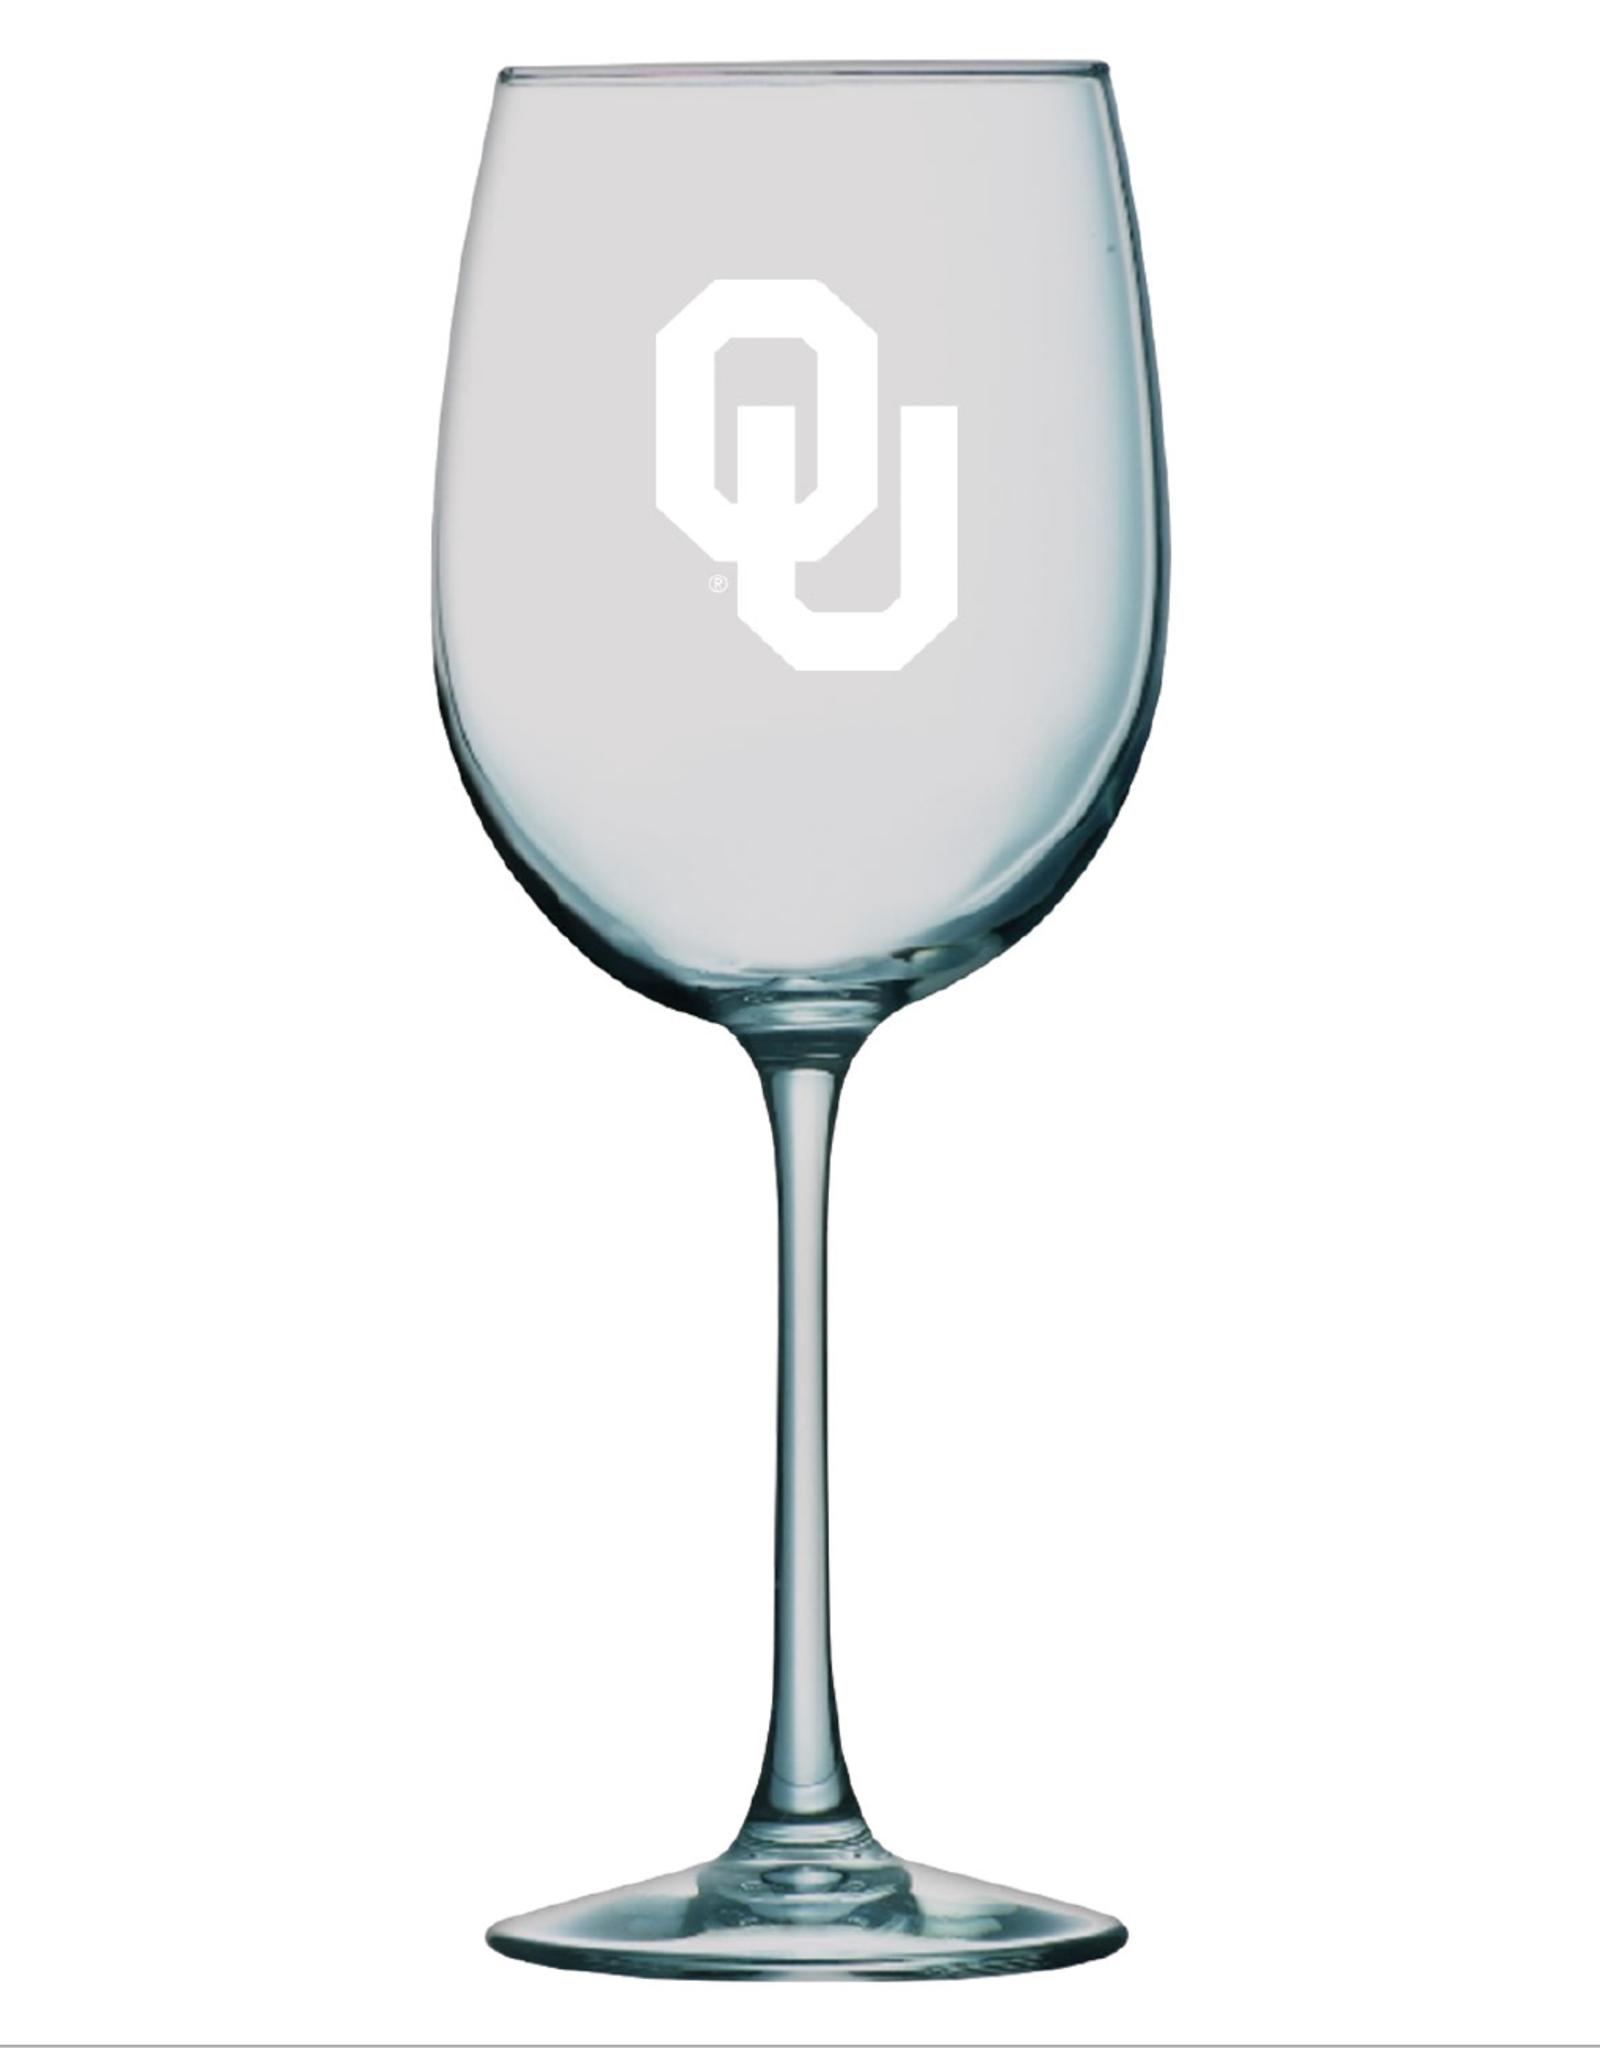 LXG LXG Etched OU 16oz Wine Glass